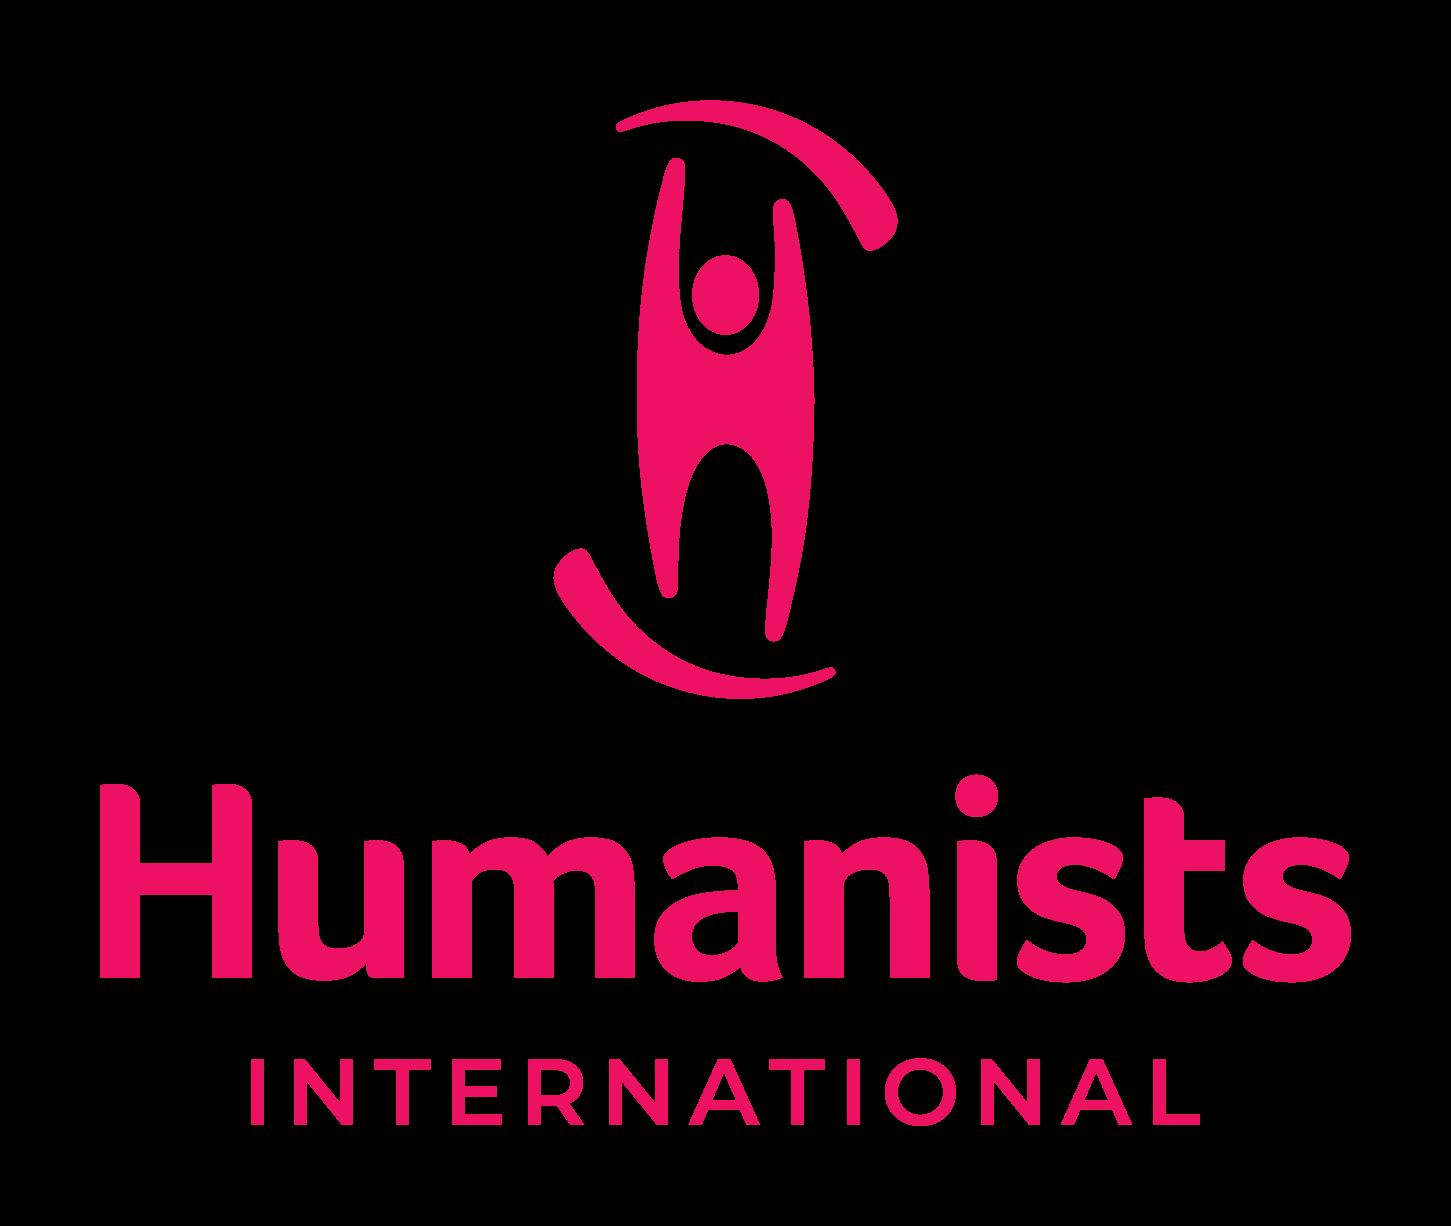 Humanists International